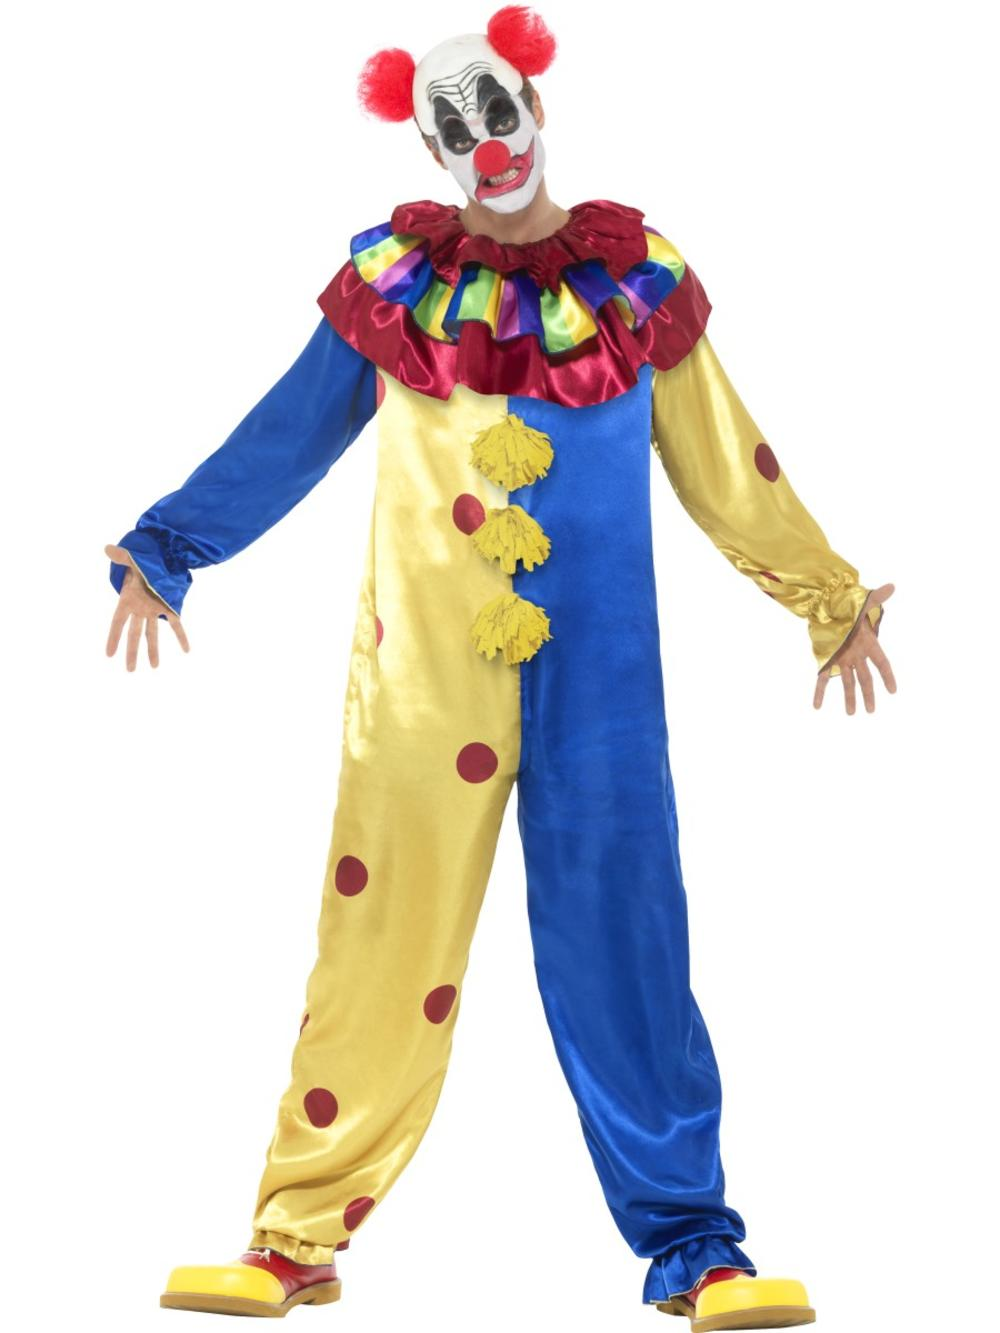 Goosebumps Clown Fancy Dress Halloween Spooky Horror Circus Adults Costume New